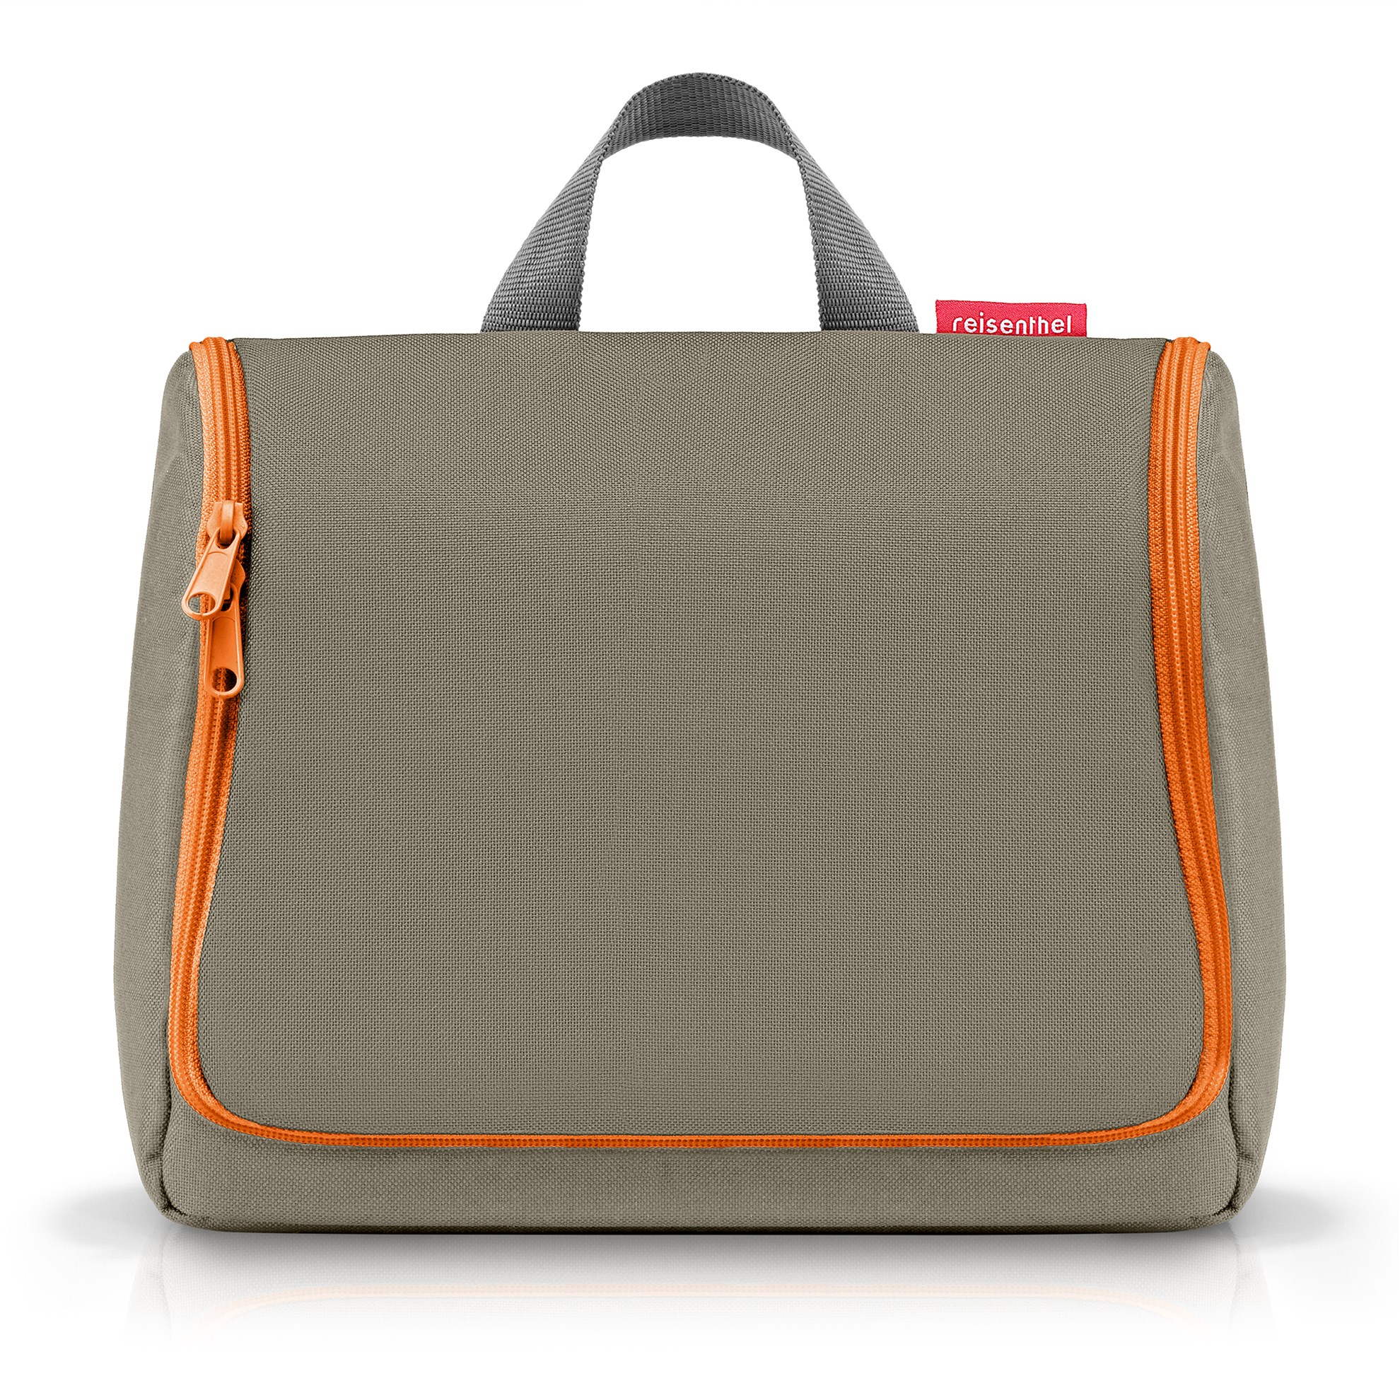 Kosmetická taška Toiletbag XL olive green_1